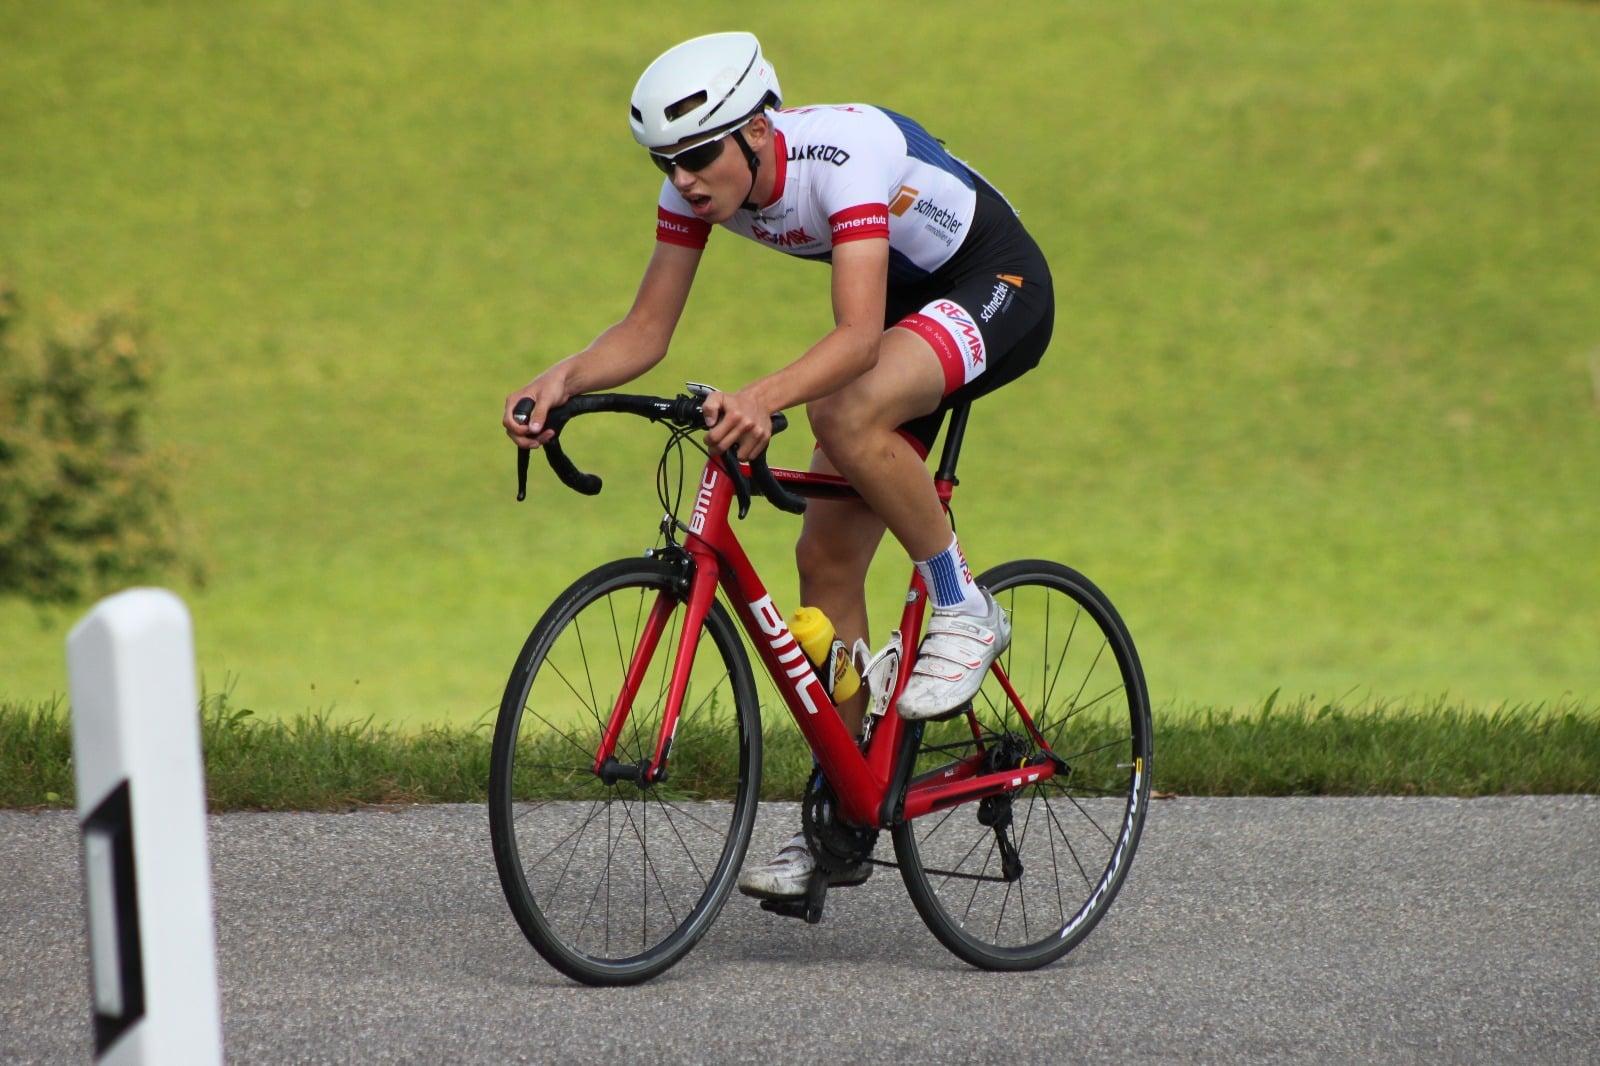 Radsportler Training Wettkampf Bergzeitfahren